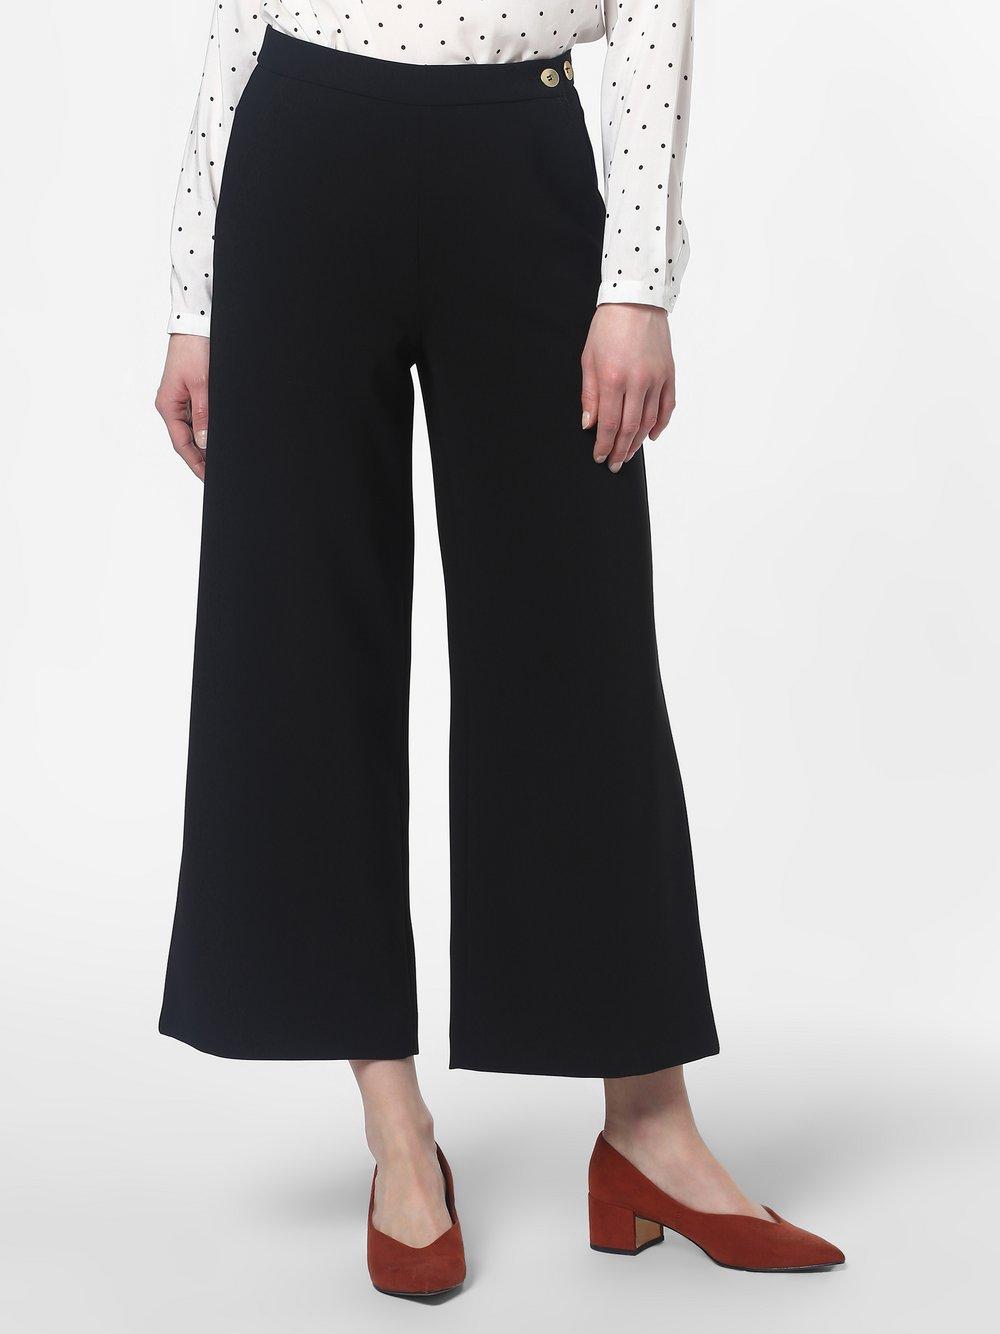 RAFFAELLO ROSSI – Spodnie damskie – Albena, czarny Van Graaf 466439-0001